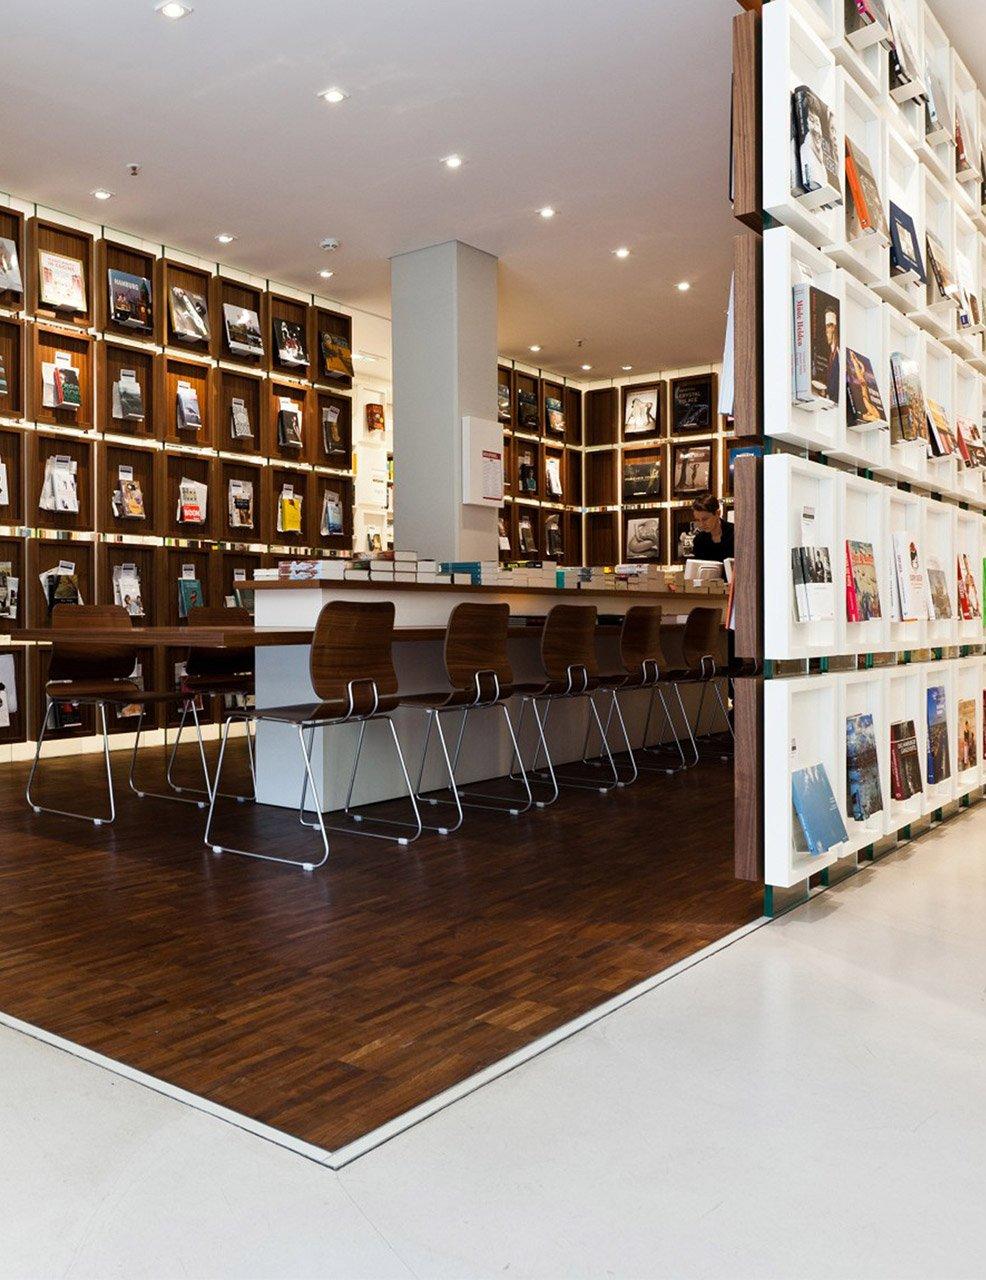 retail baierl demmelhuber. Black Bedroom Furniture Sets. Home Design Ideas